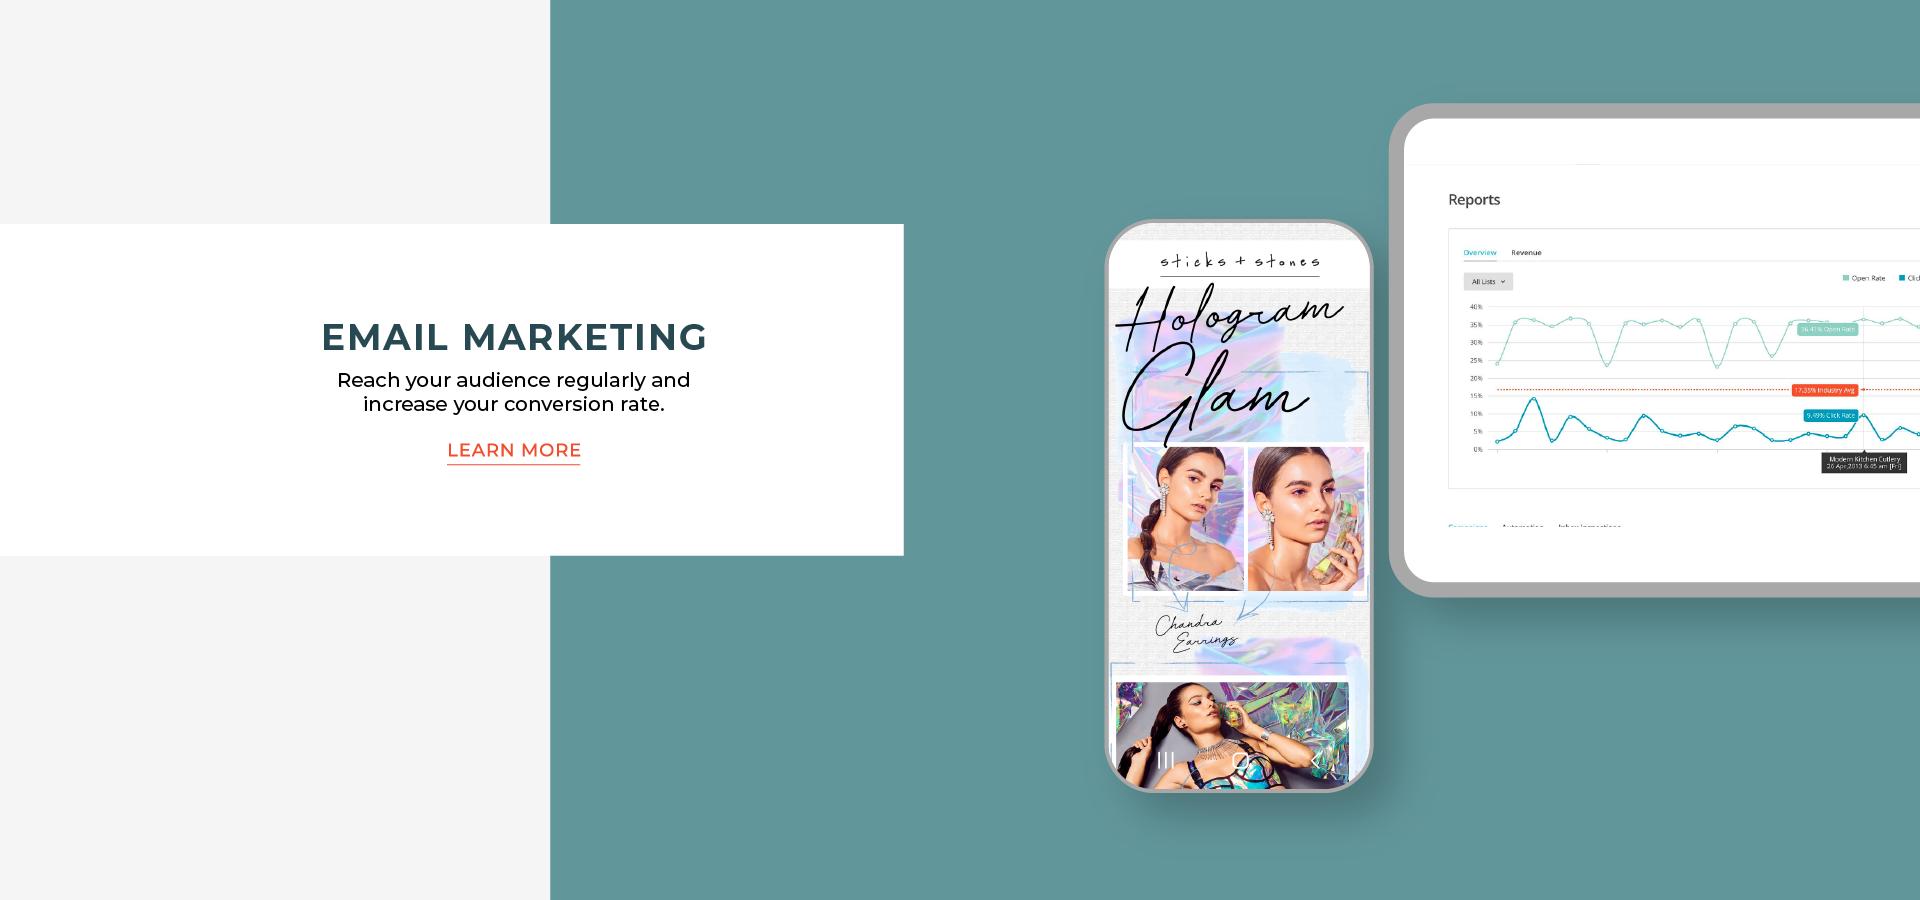 kat fox design email marketing services